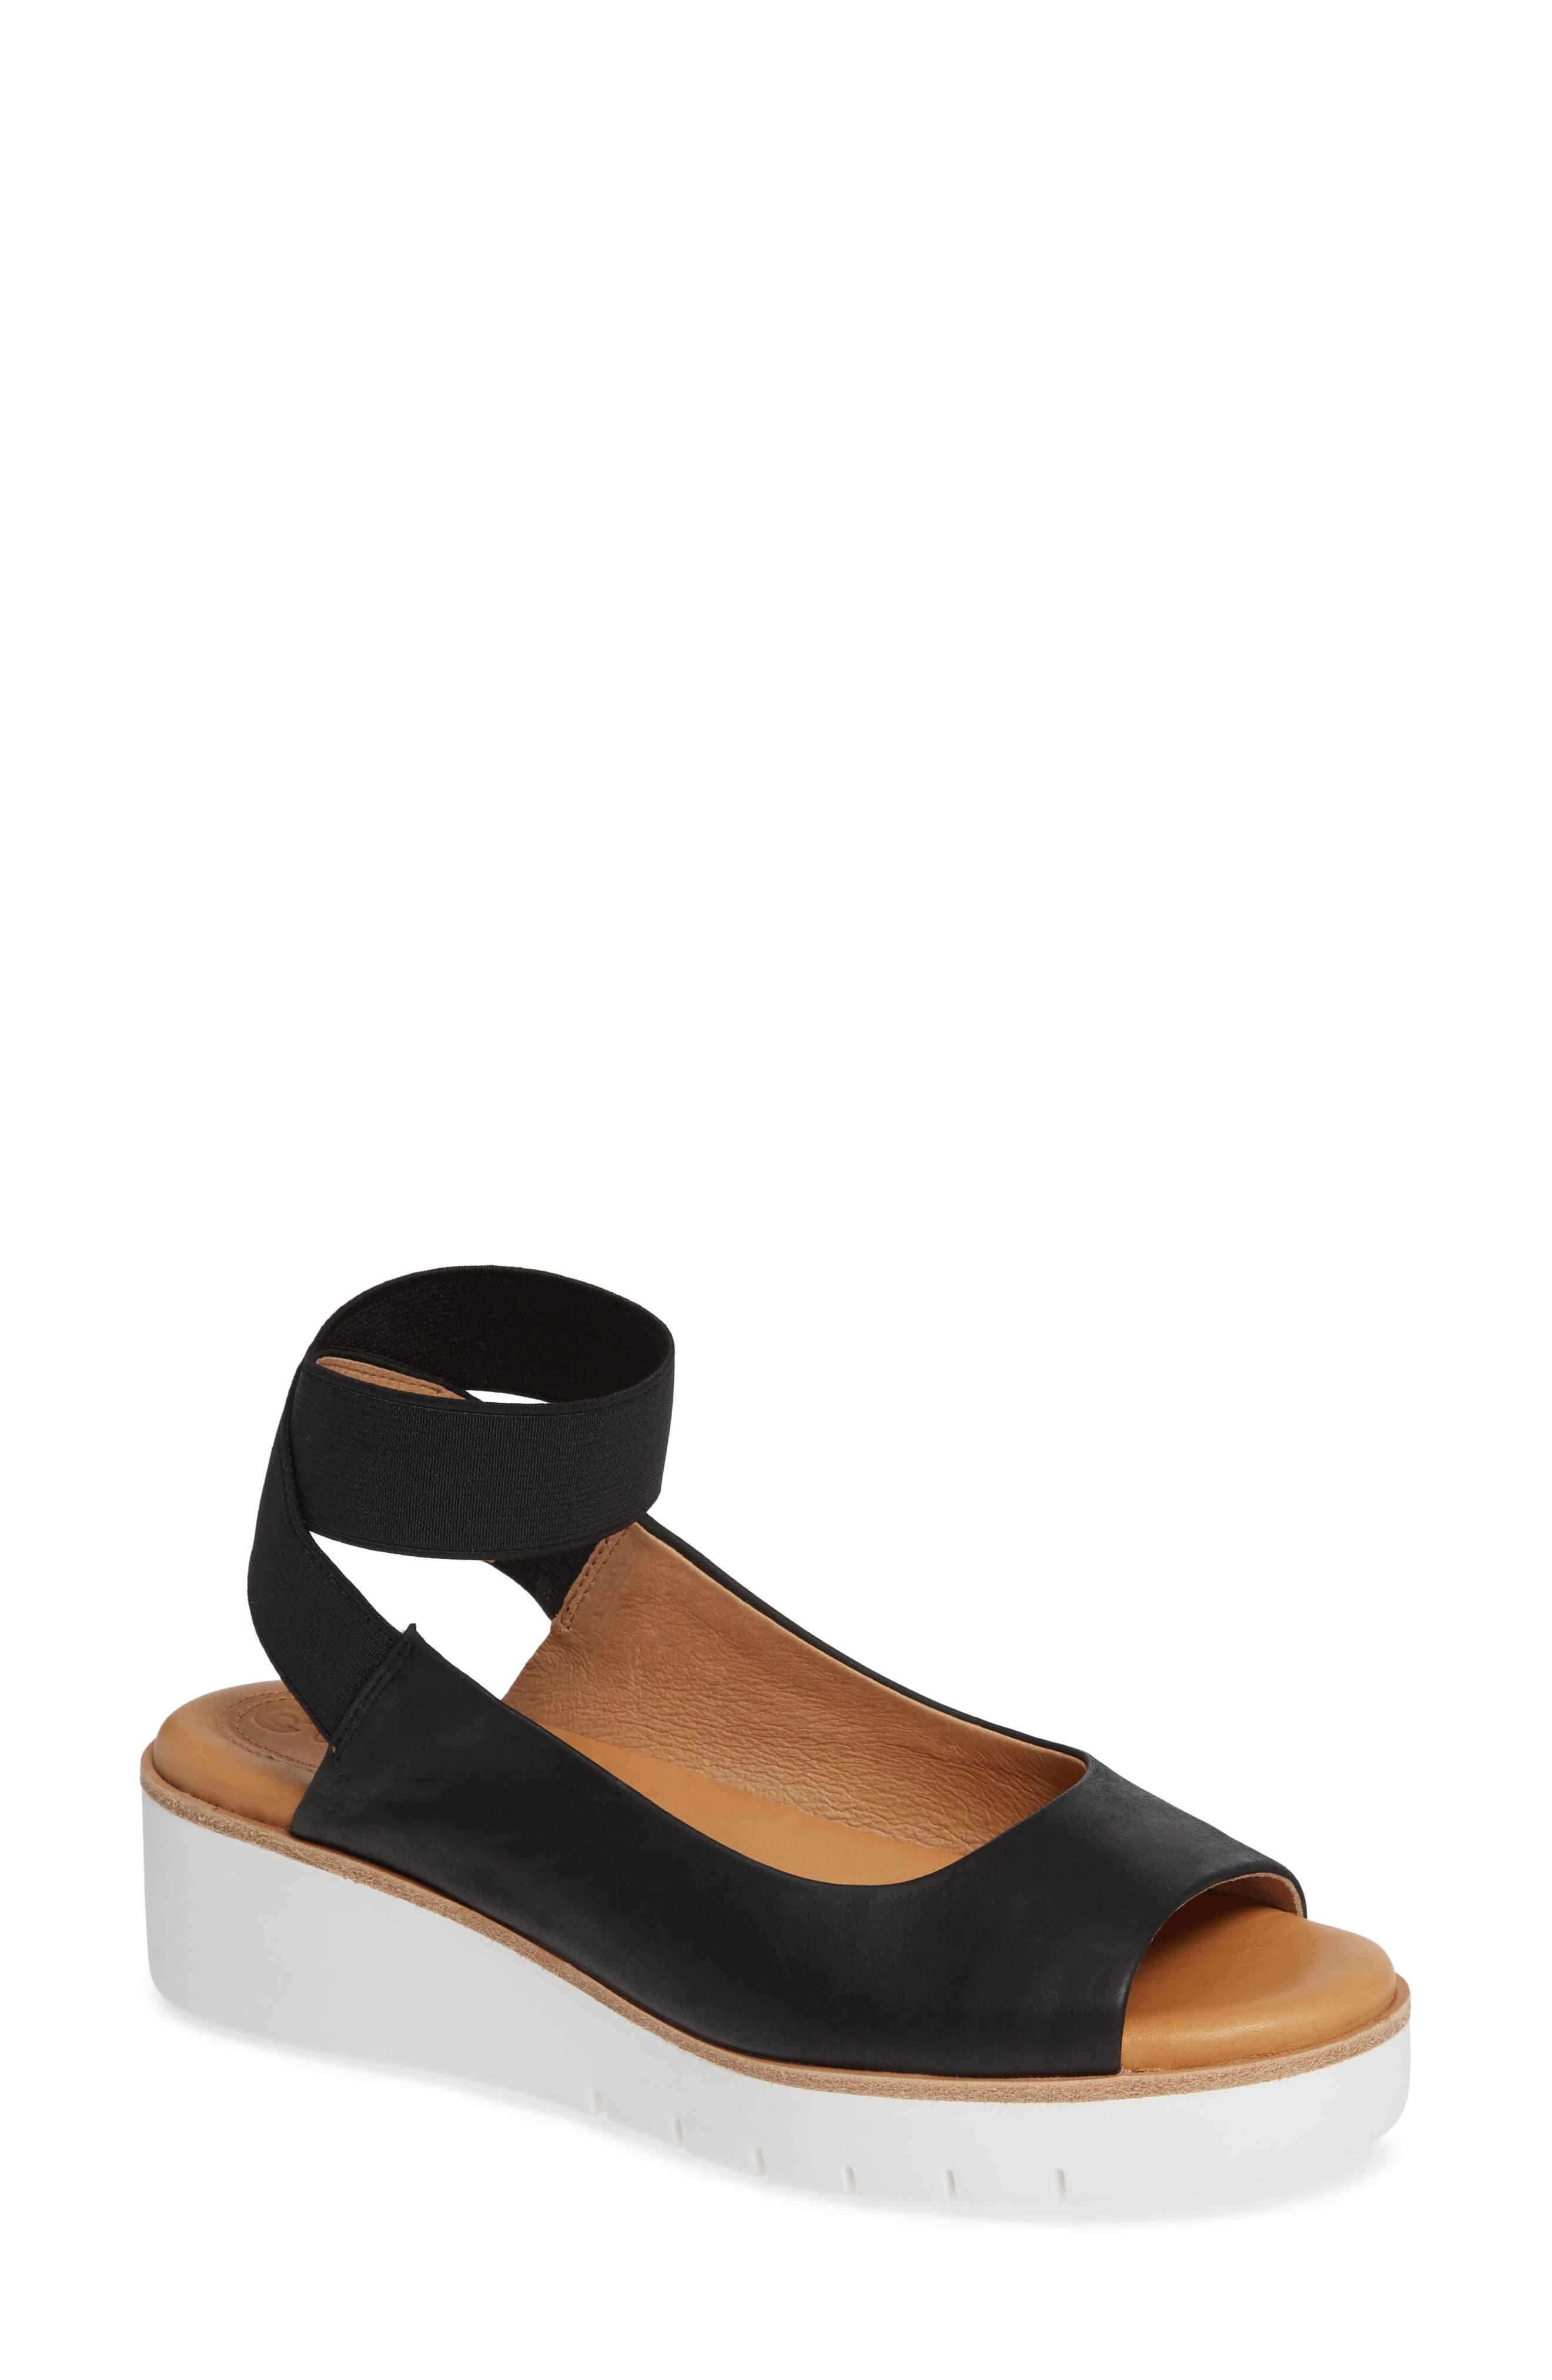 Beeata Wedge Sandal,                         Main,                         color, BLACK LEATHER